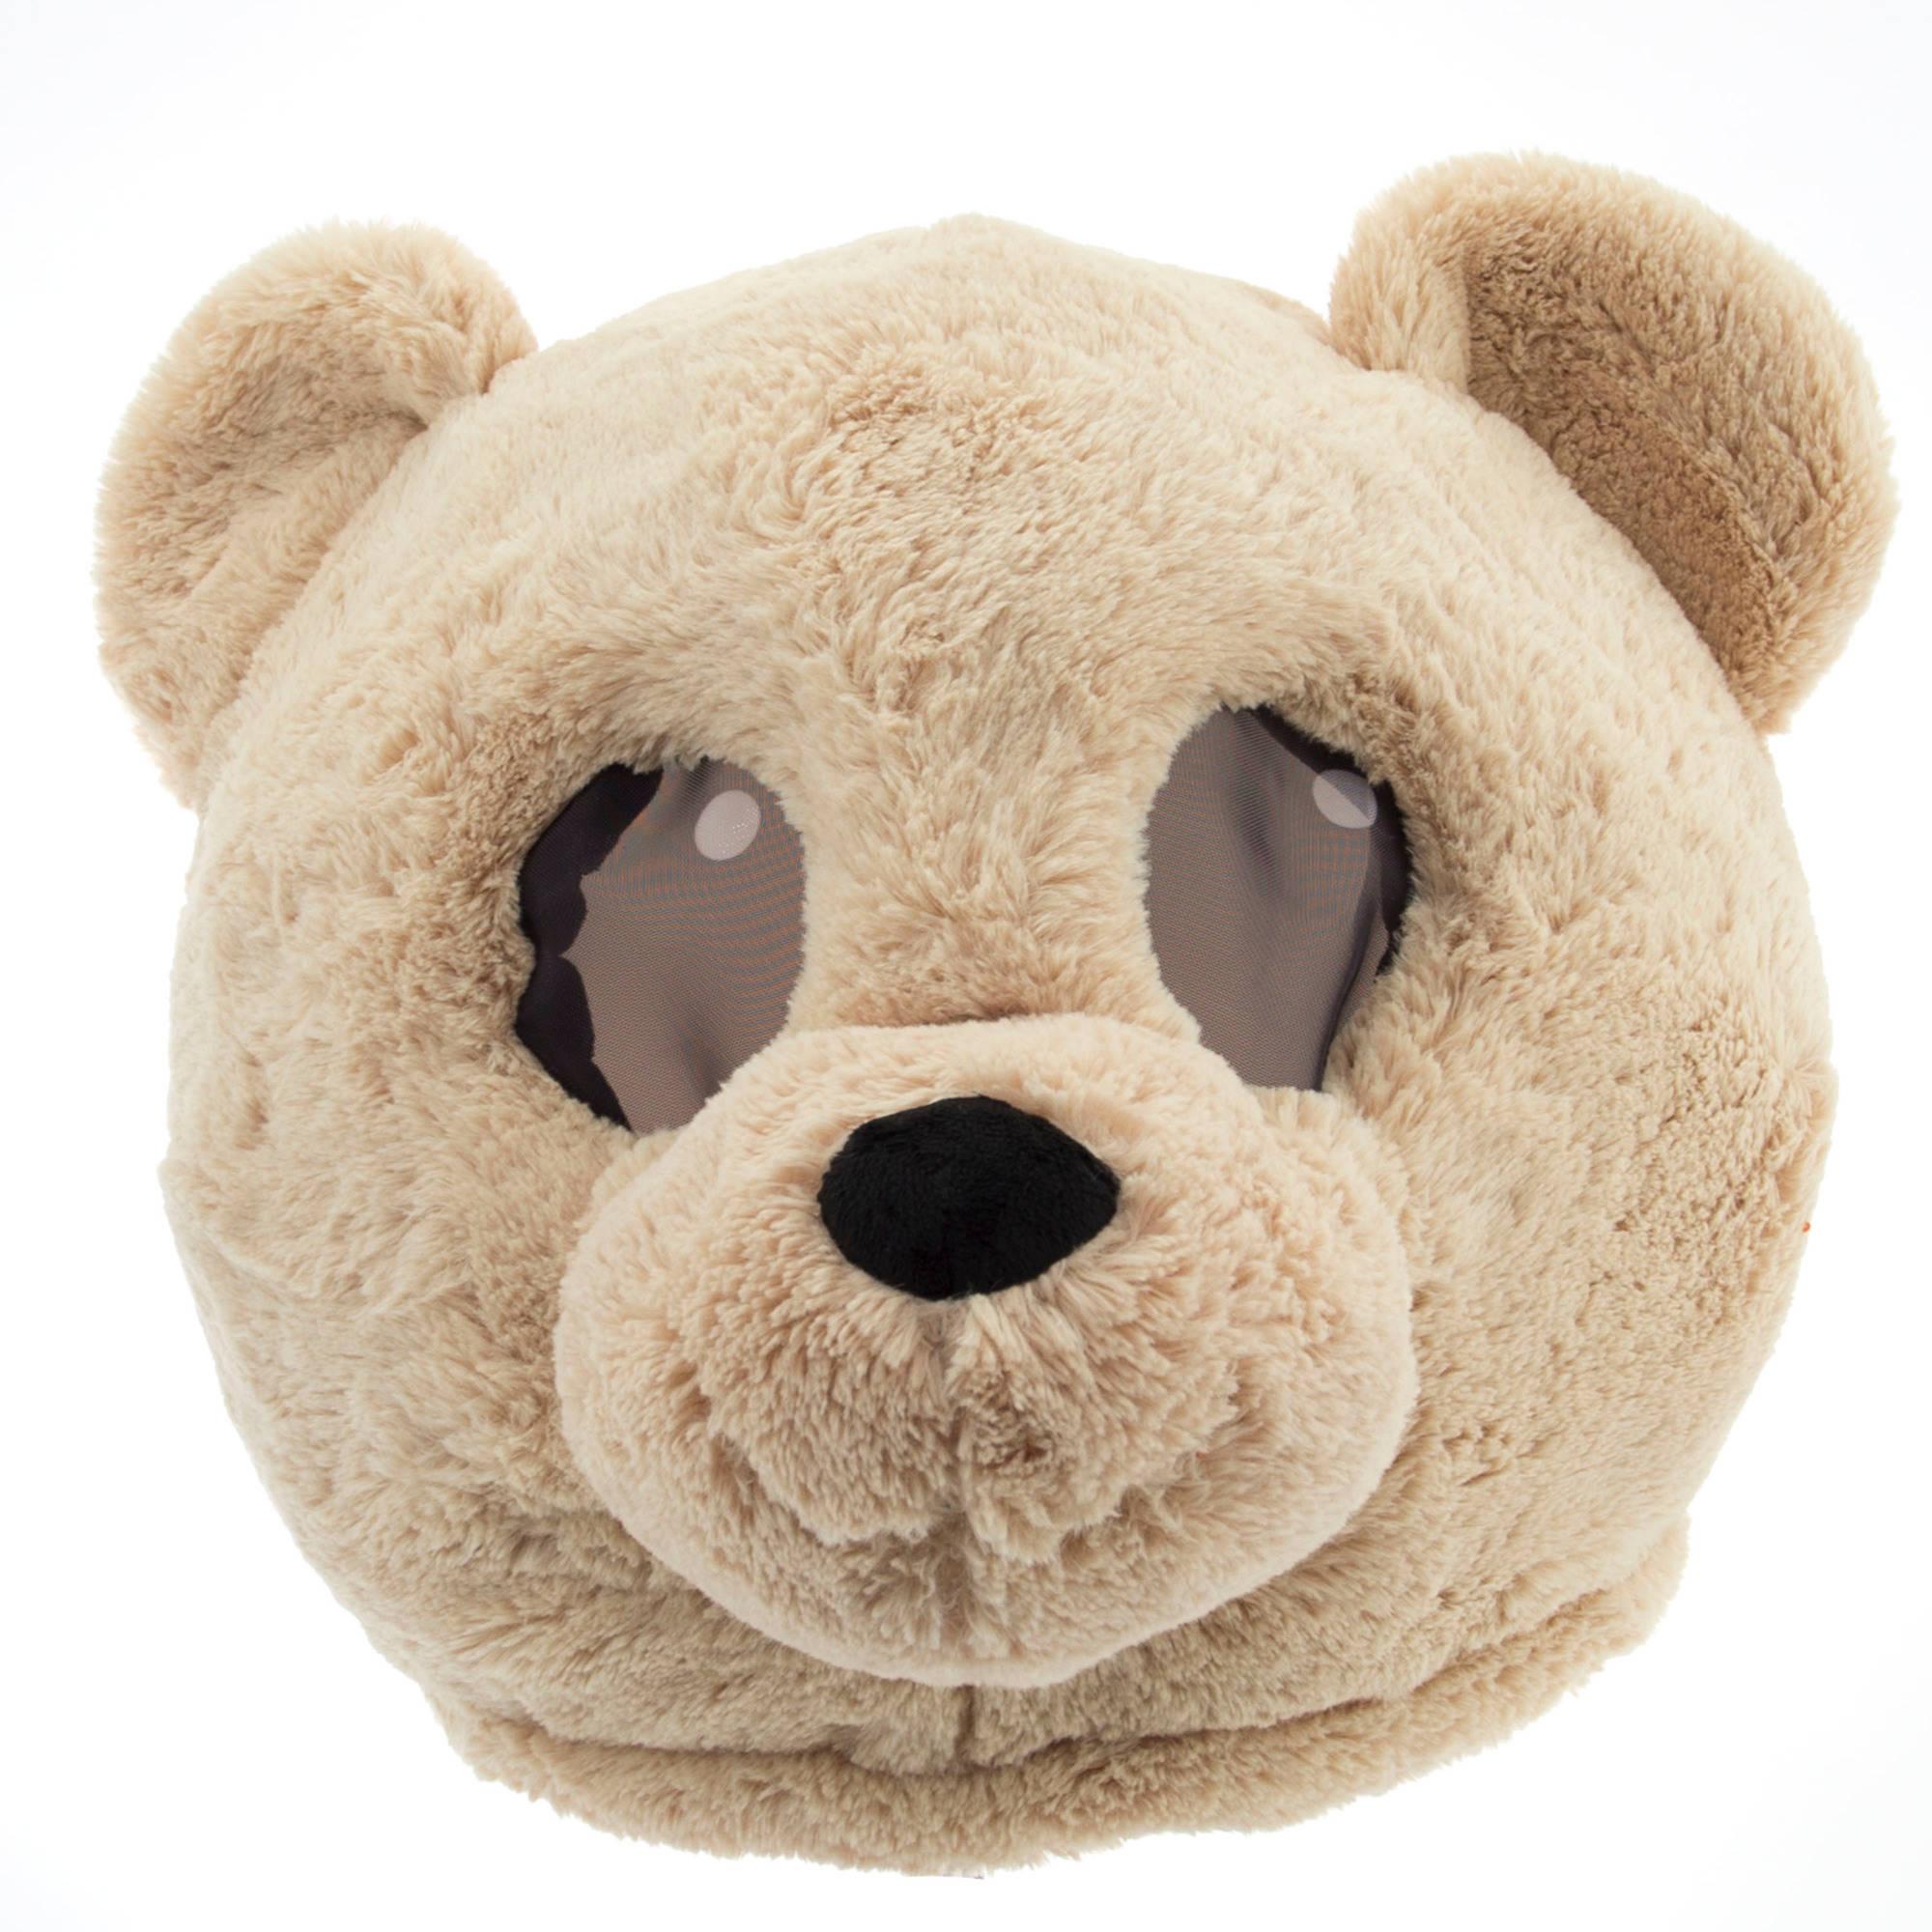 Tan Teddy Maskimal Adorable Large Plush Head Mask Walmart Com